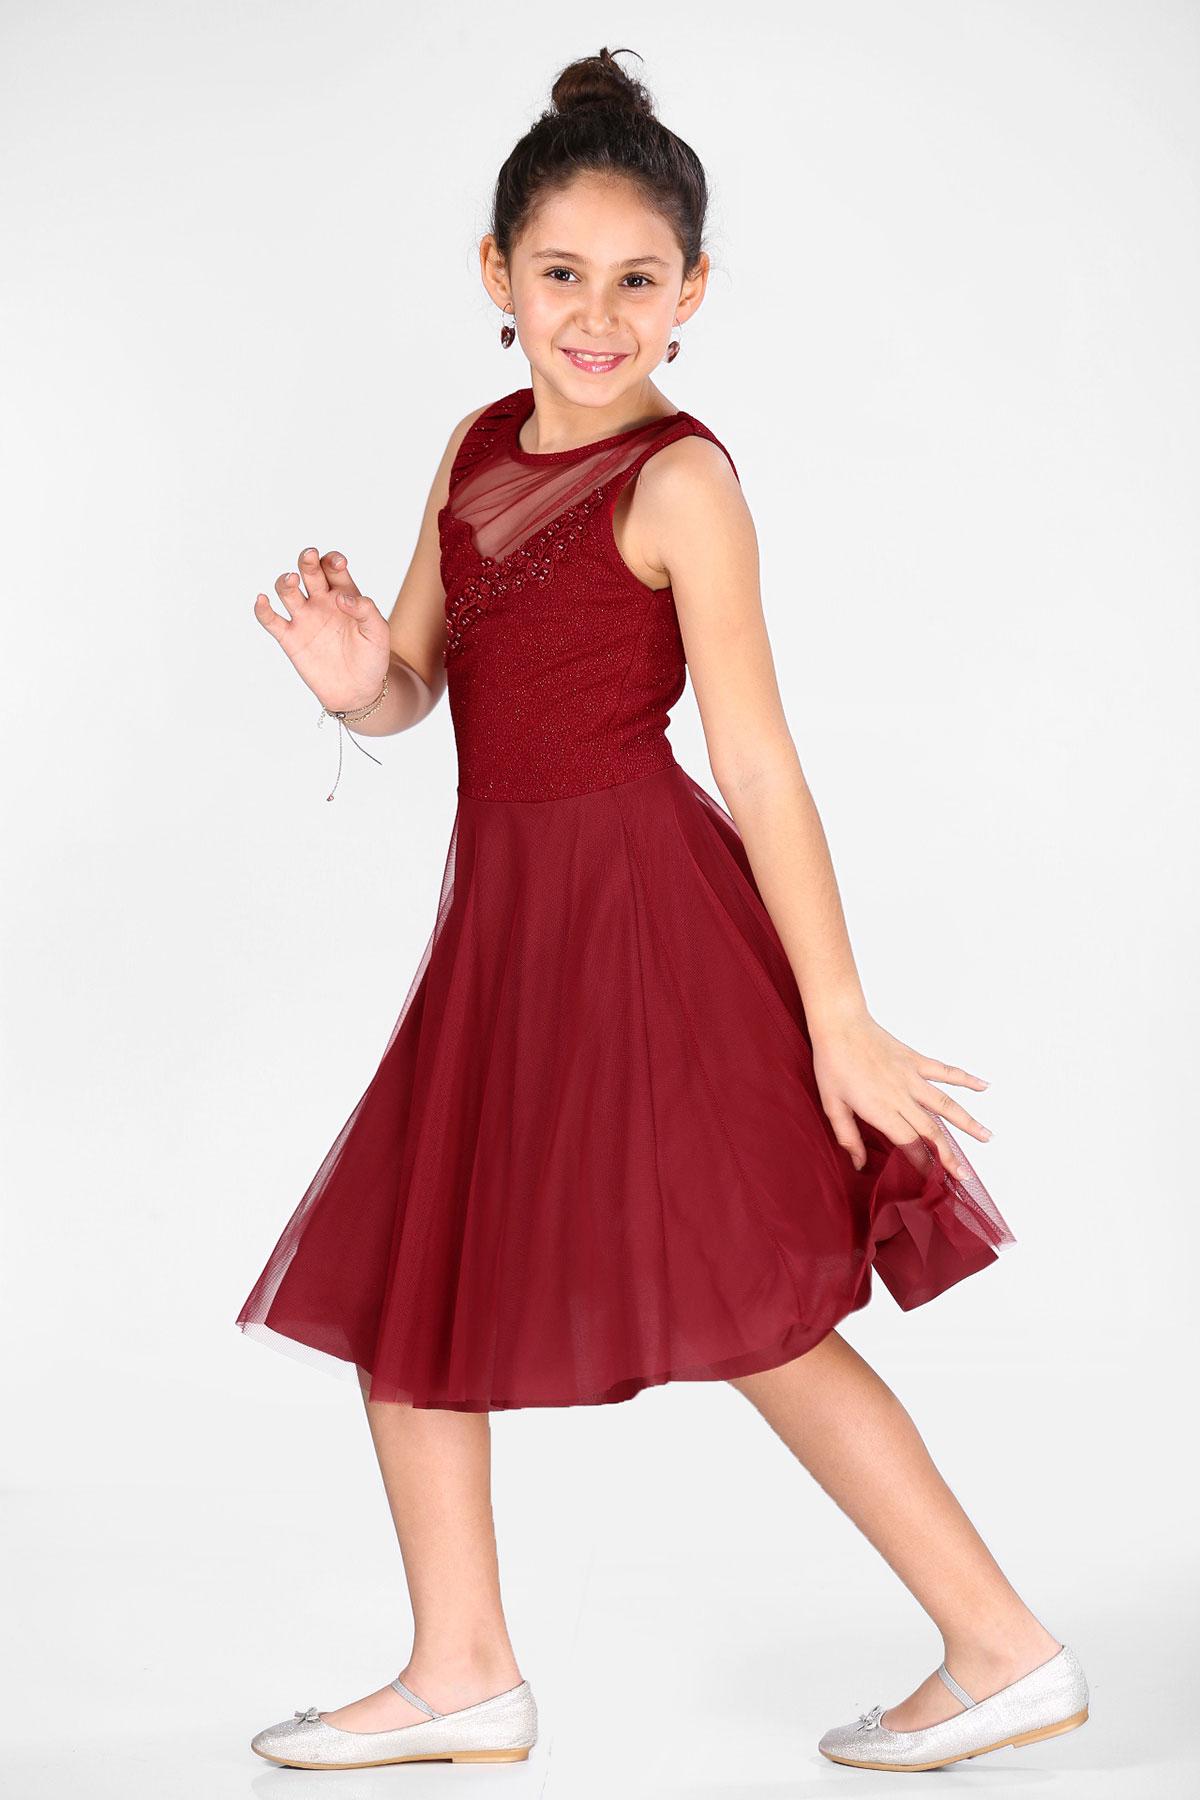 Girl's Red Evening Dress